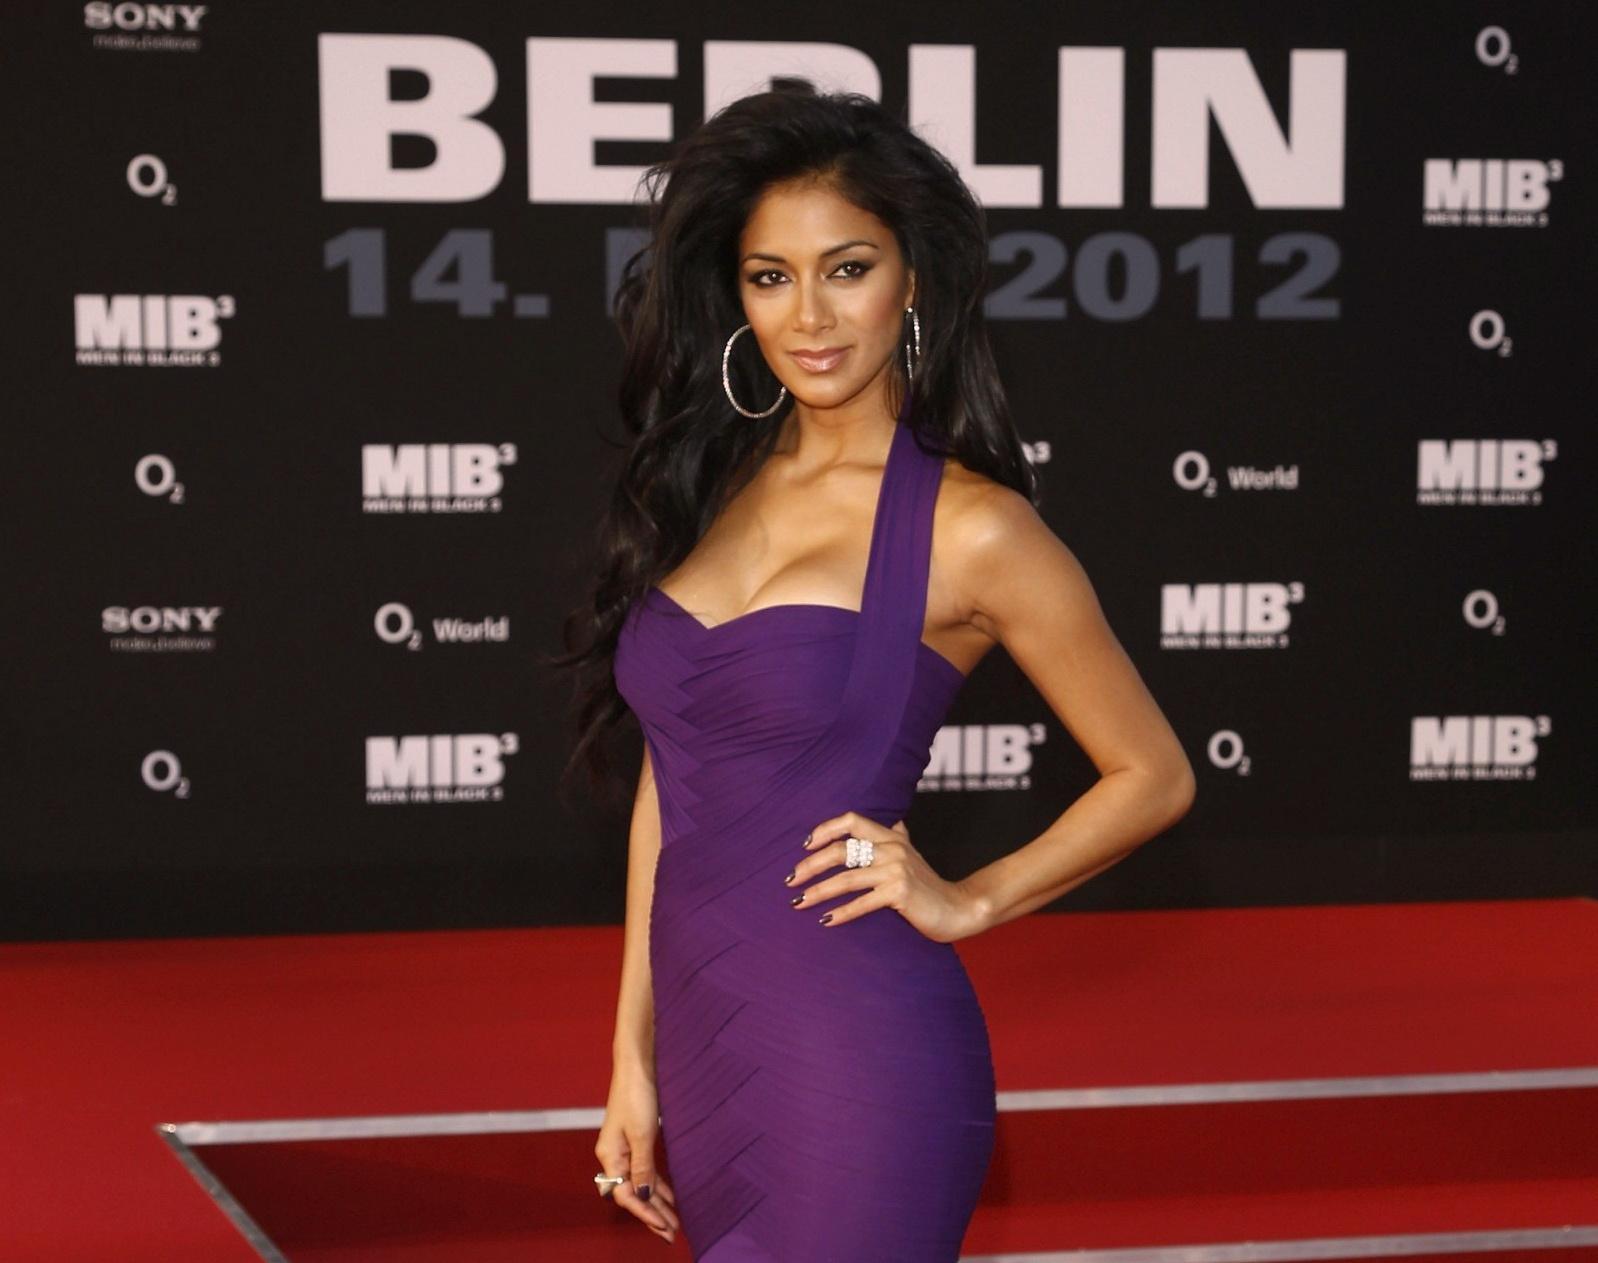 http://1.bp.blogspot.com/-3vnuJlt7qaQ/T7JOG2giVzI/AAAAAAAAFQw/SwGJ-qA7Zjk/s1600/Nicole+Scherzinger-Men+in+Black+3-premiere-Germany-00.jpg